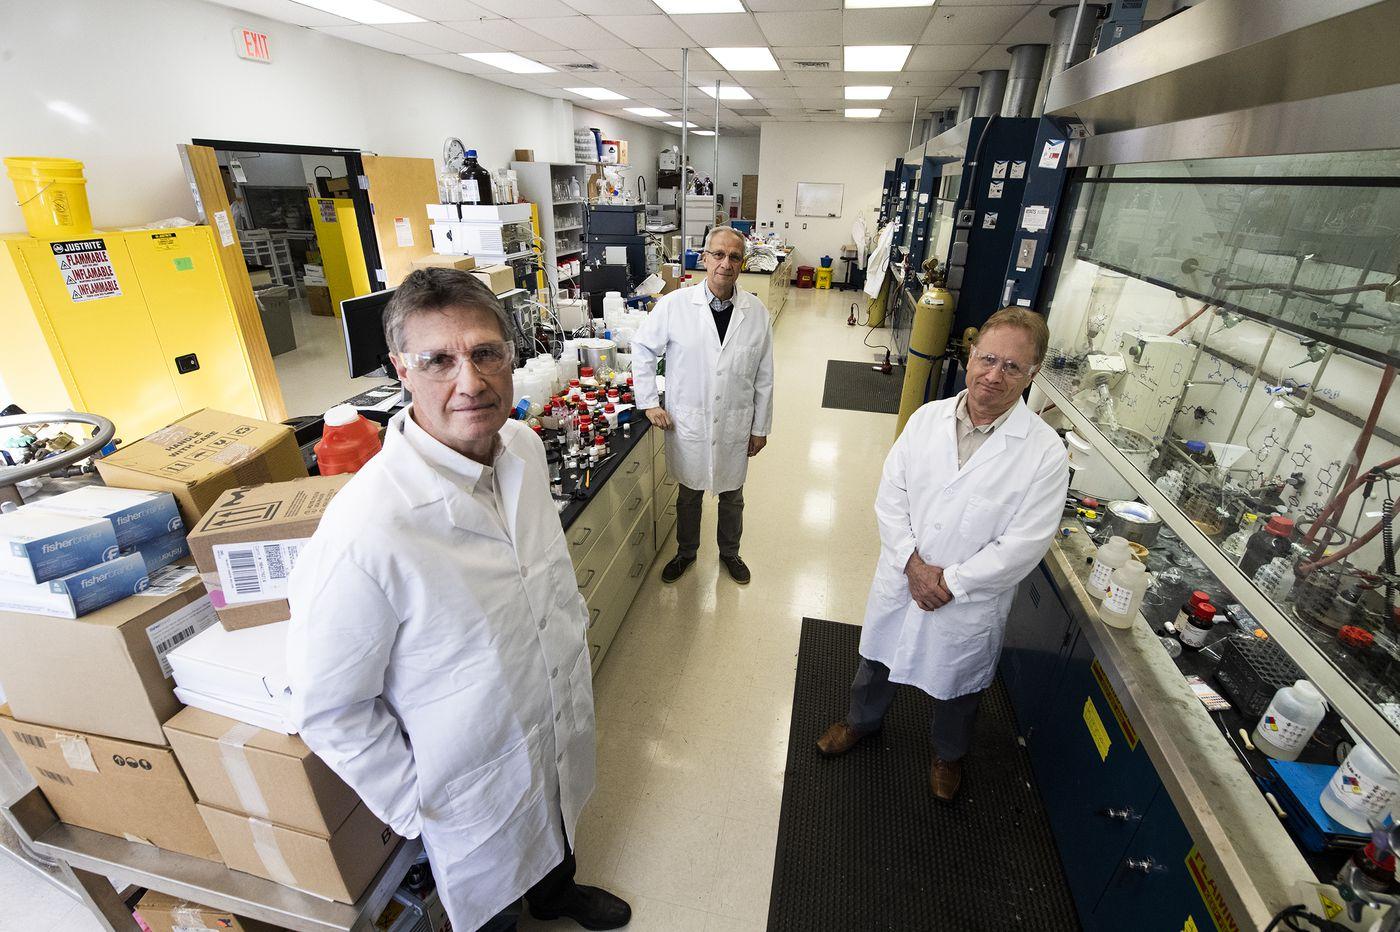 Malvern drugmaker is hopeful where others struggle: Fighting deadly 'superbugs'